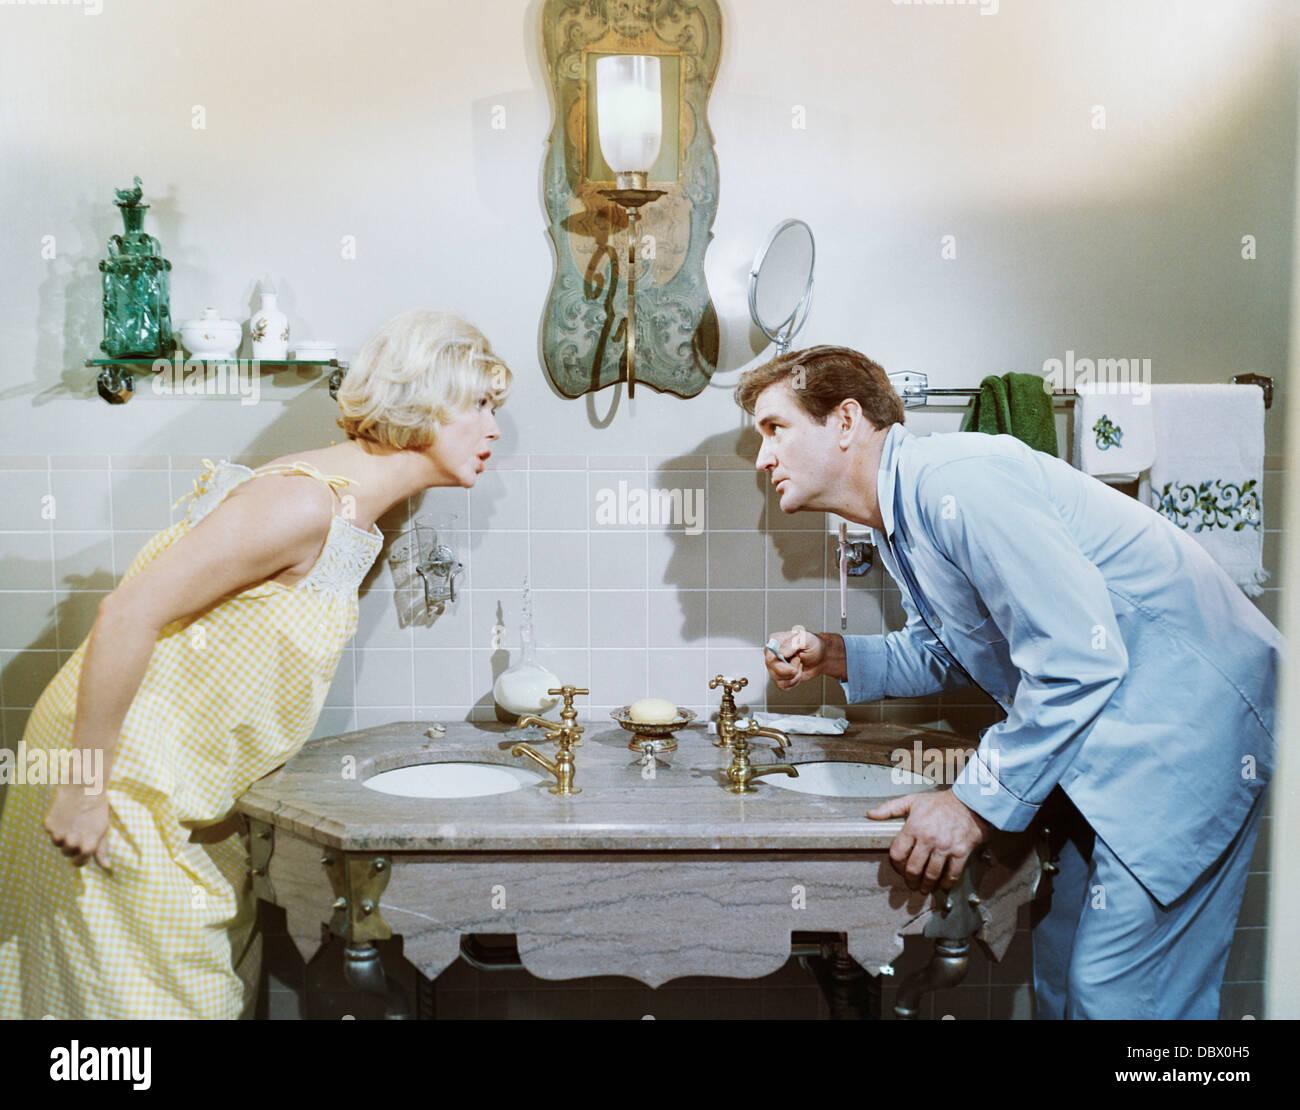 1960s 1965 ROMANTIC COMEDY DO NOT DISTURB ROD TAYLOR DORIS DAY - Stock Image